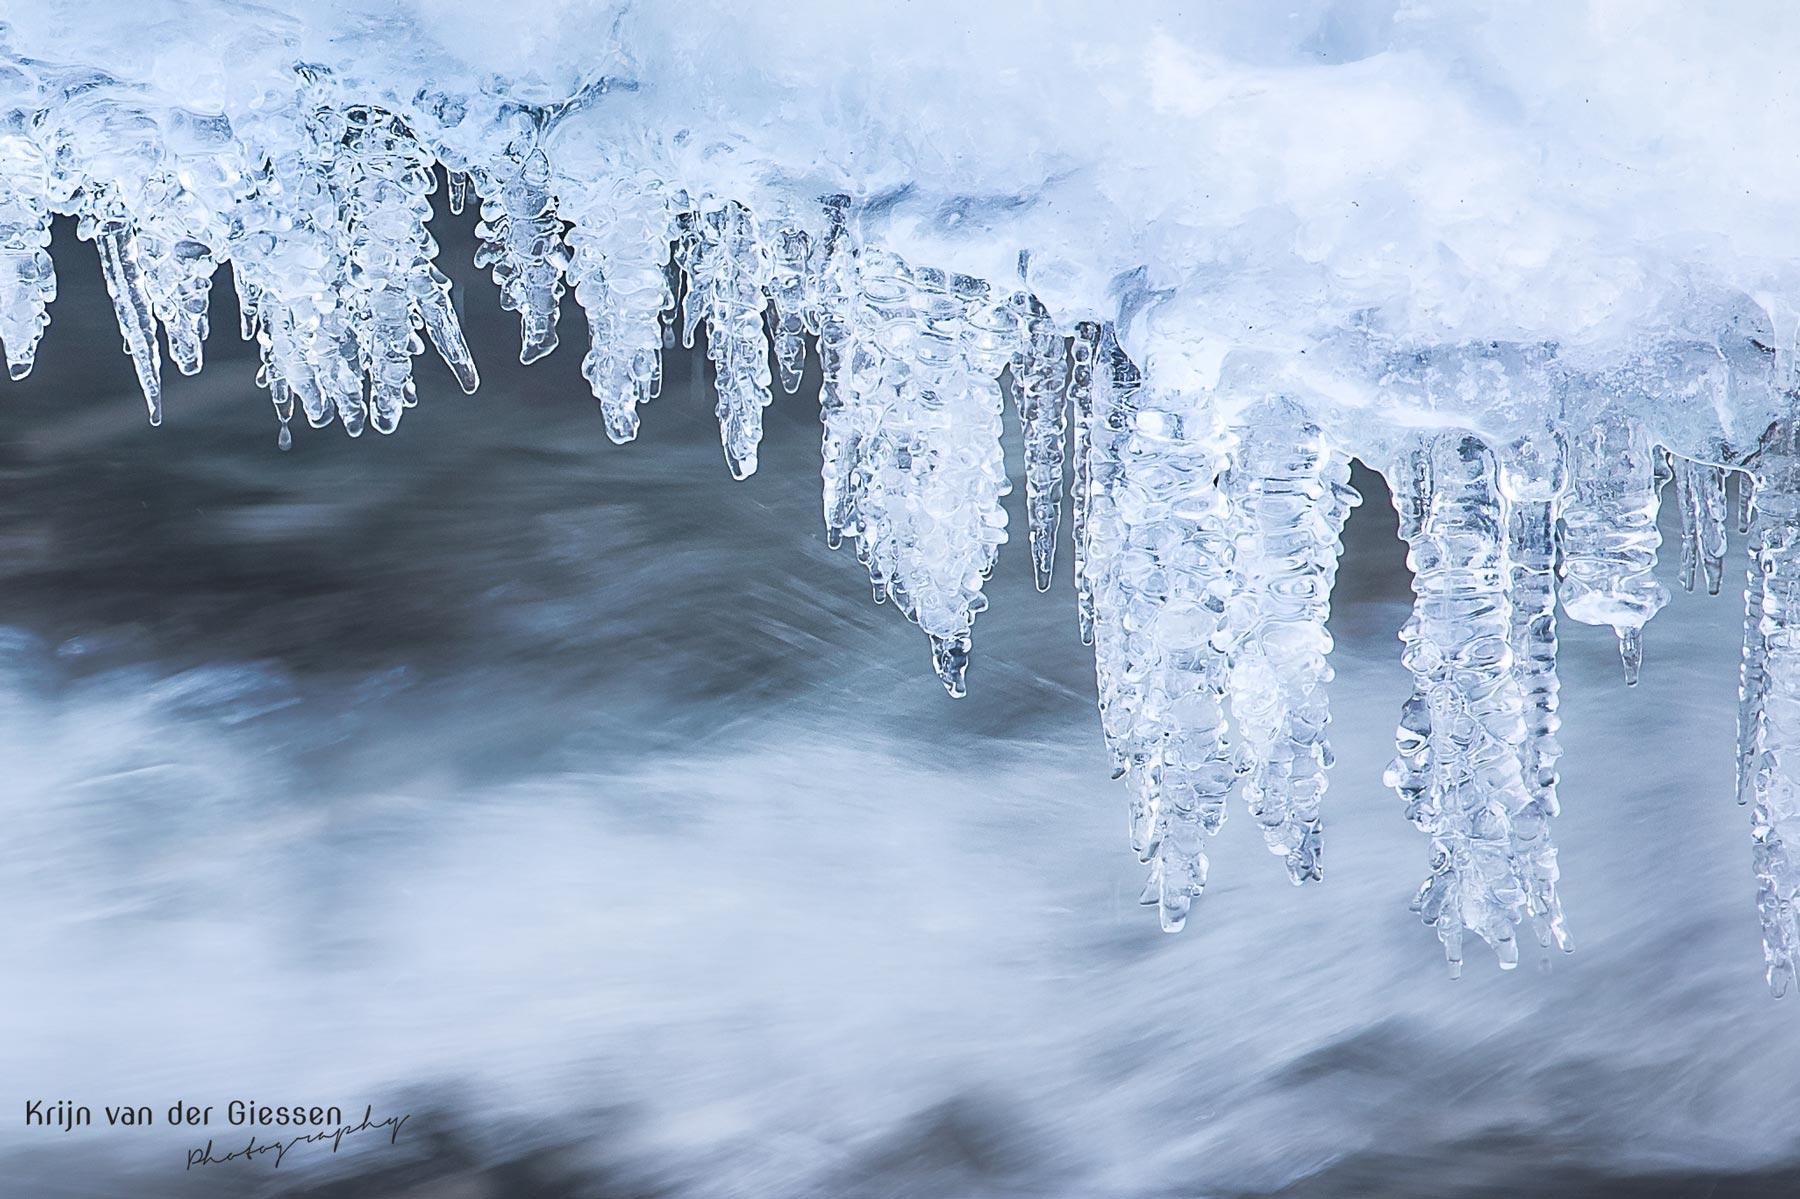 Storforsen waterfall icicle Zweden winterphotography tips